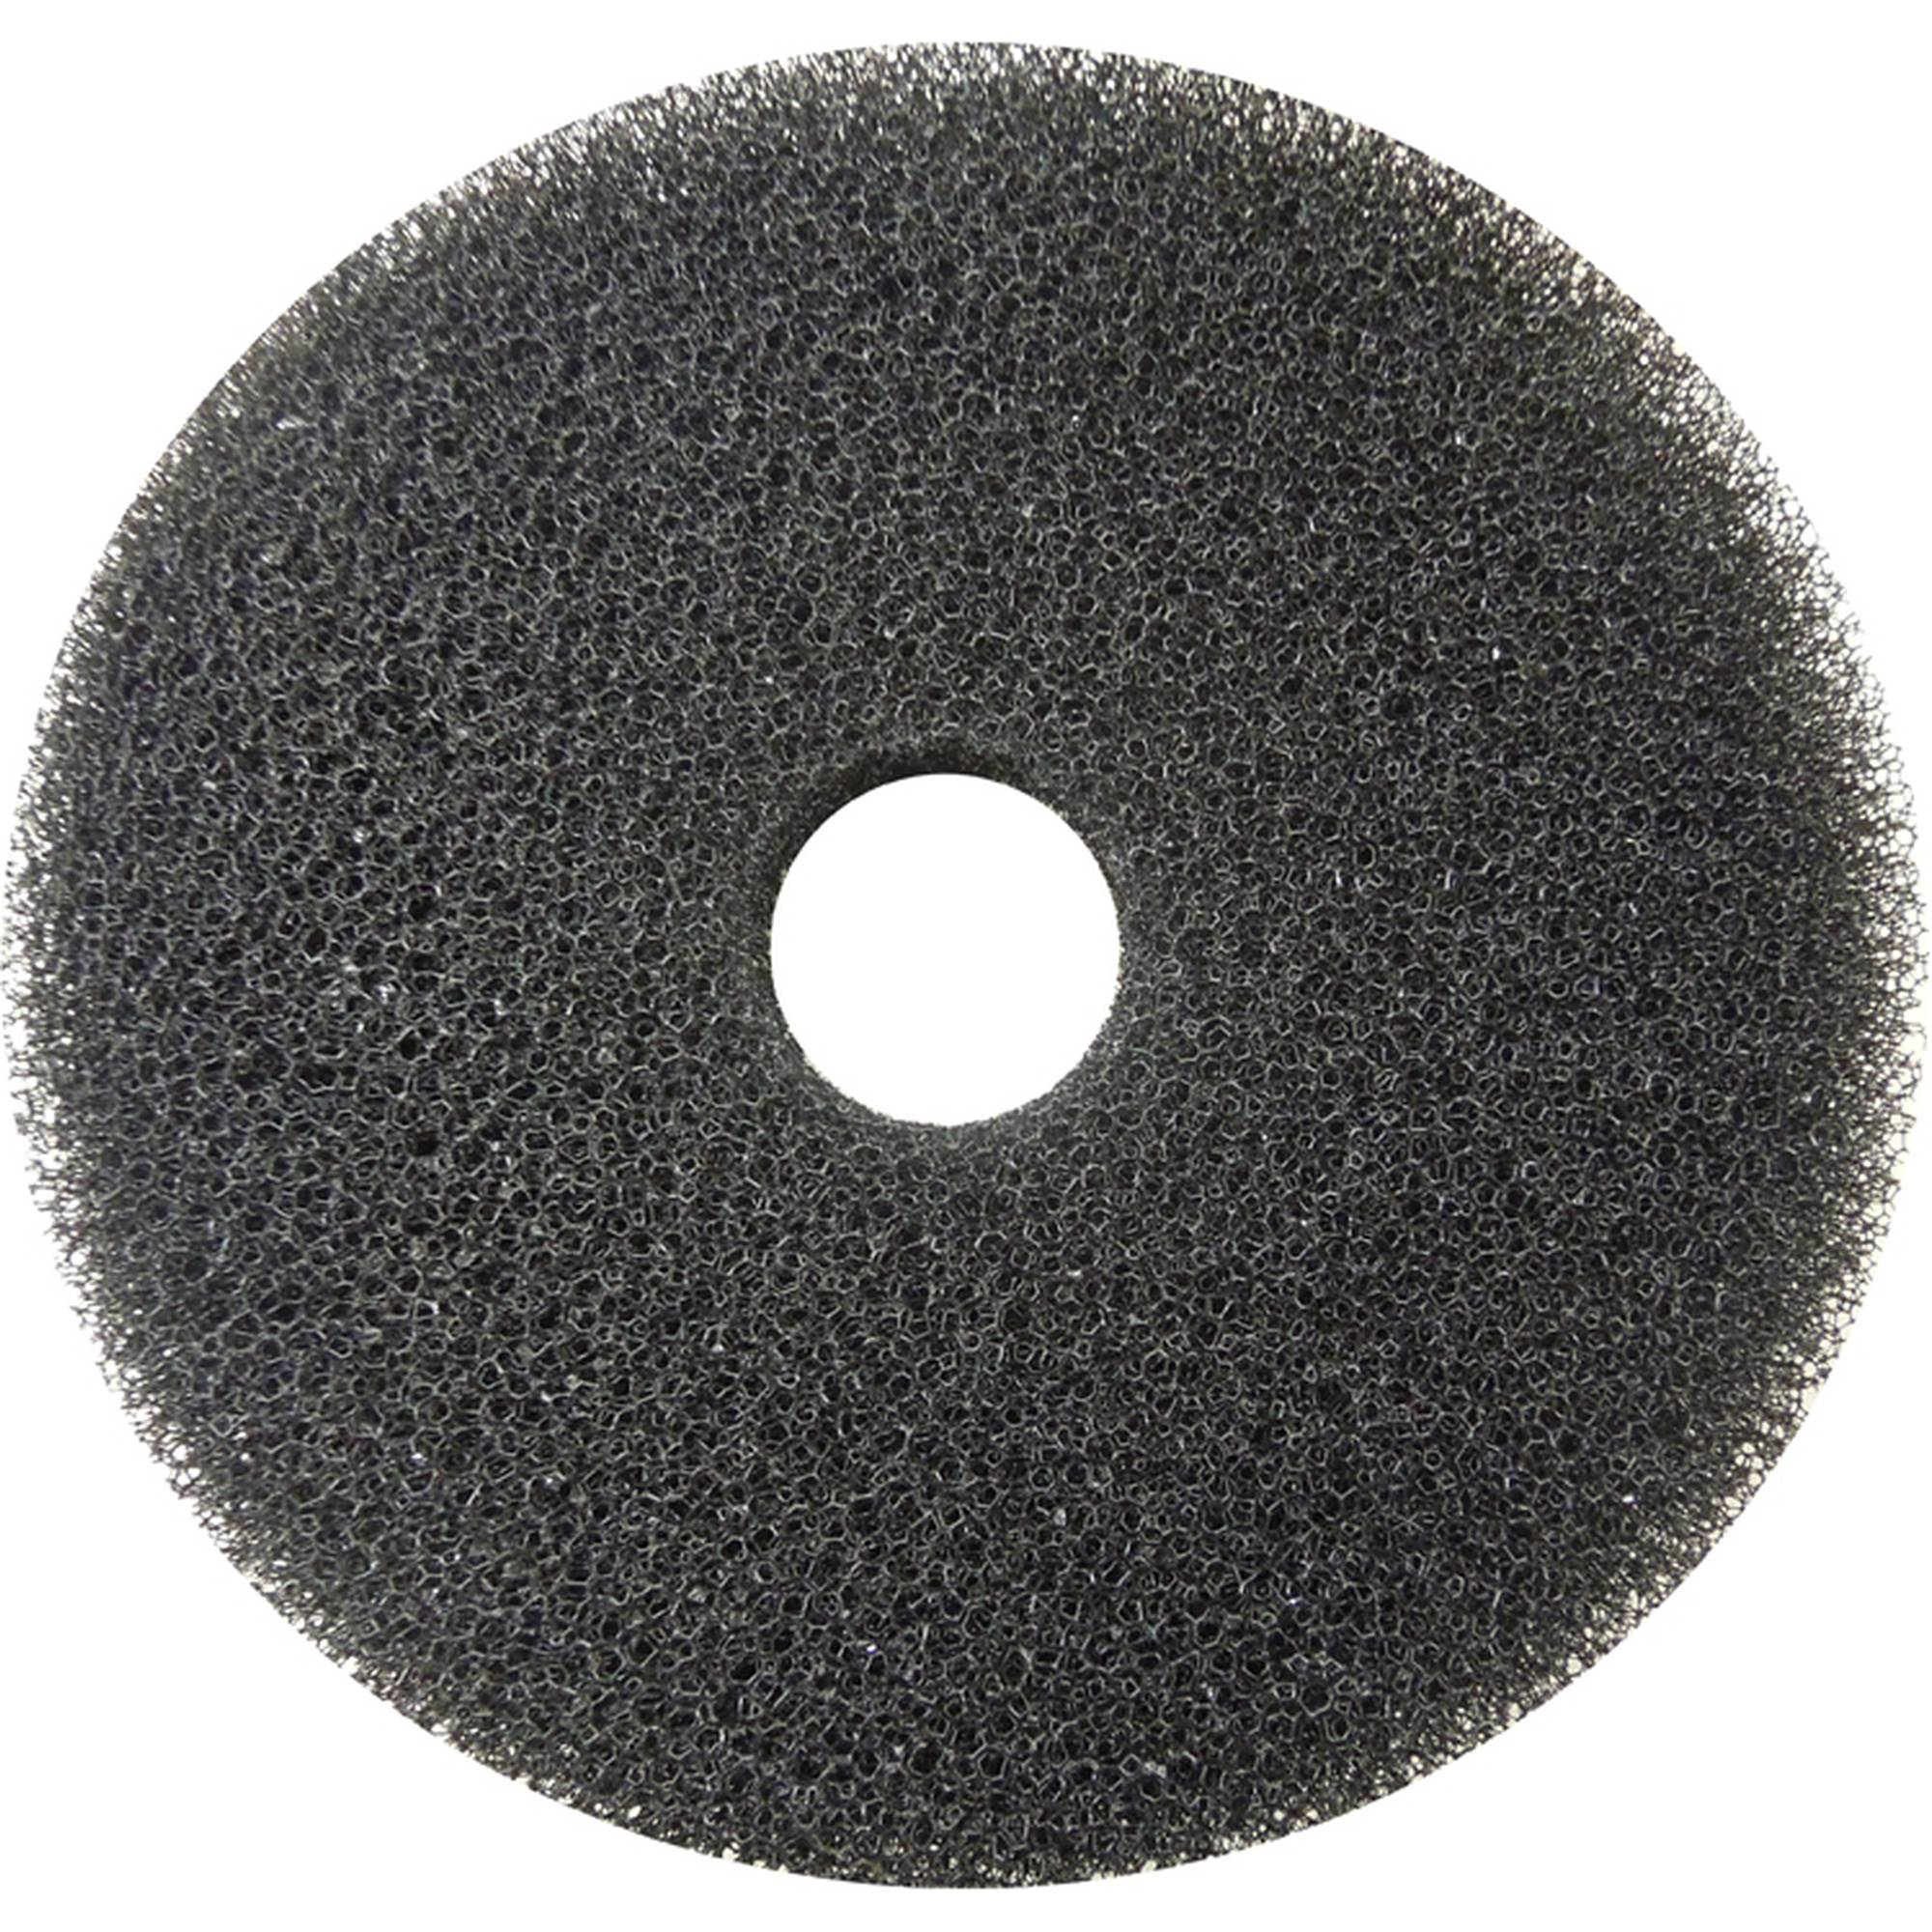 Filtersponge rough/black FPU10000-00